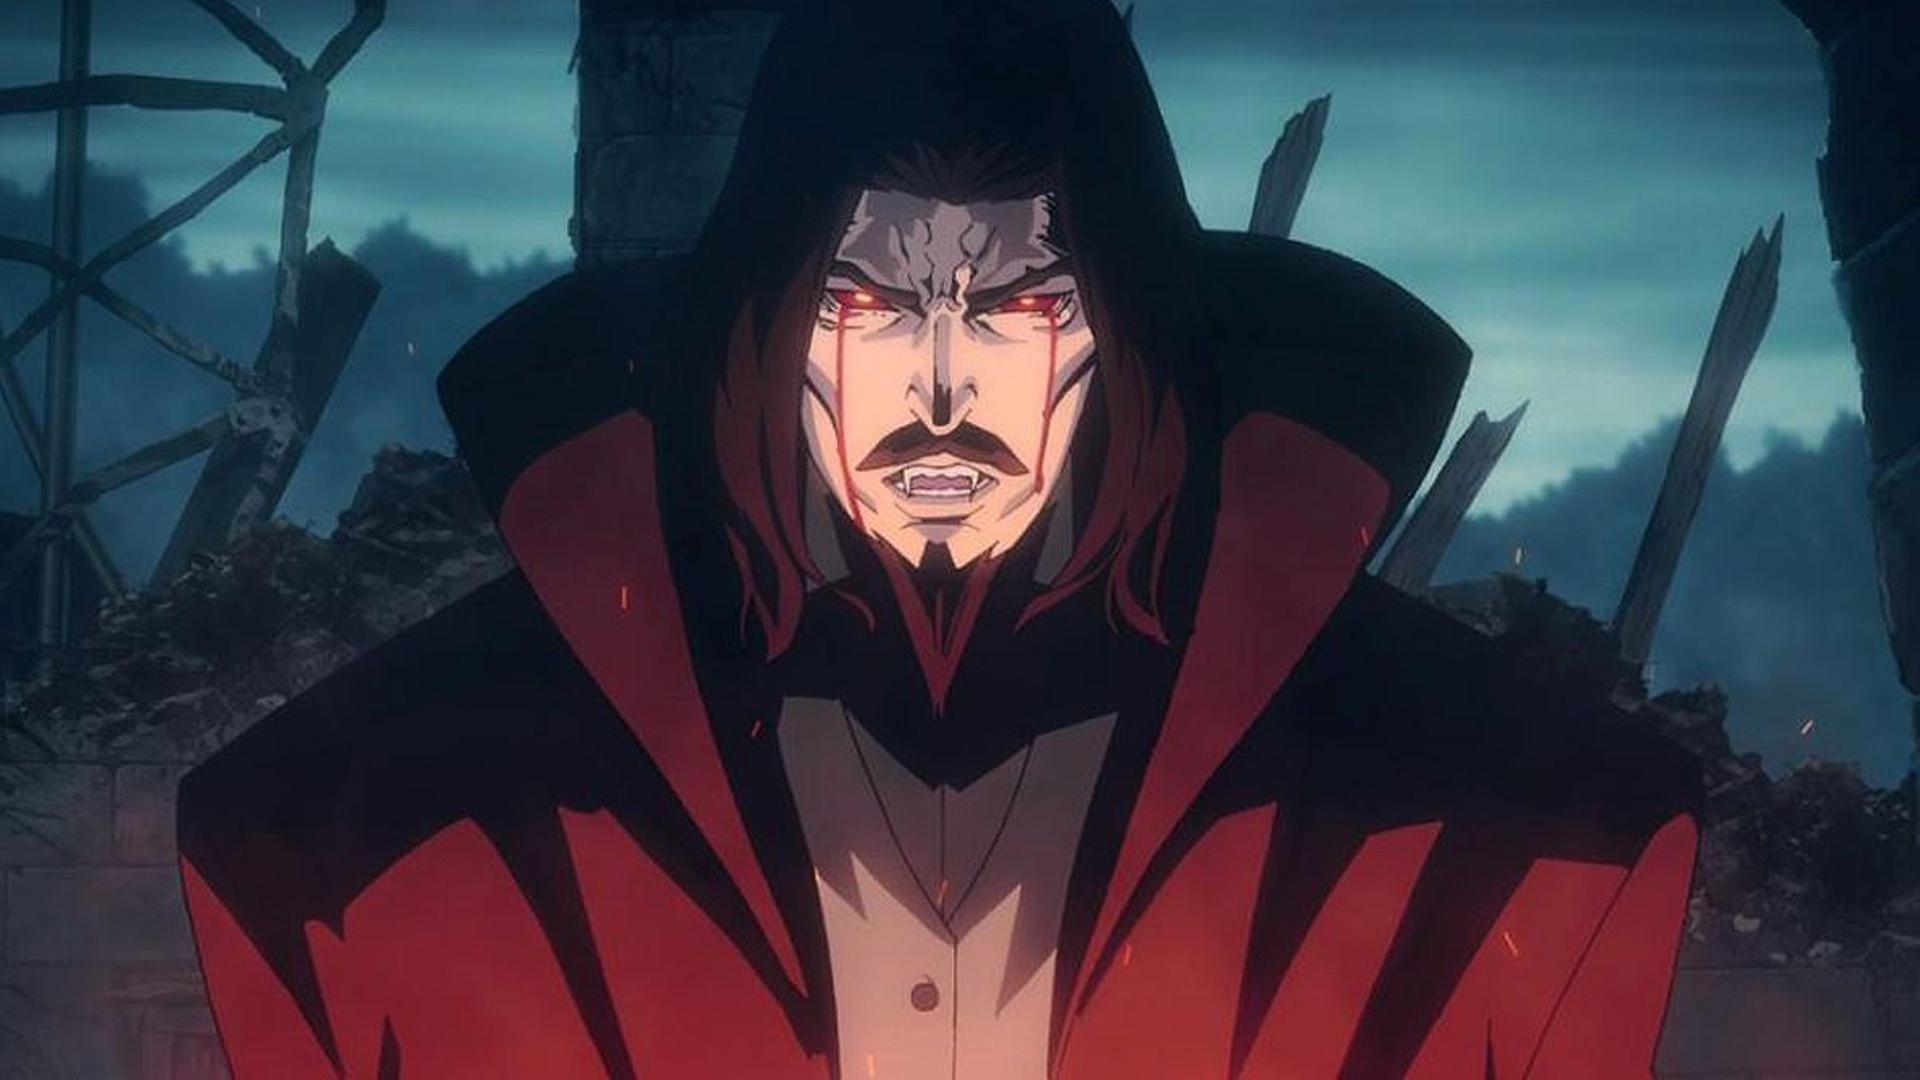 Castlevania to release new season